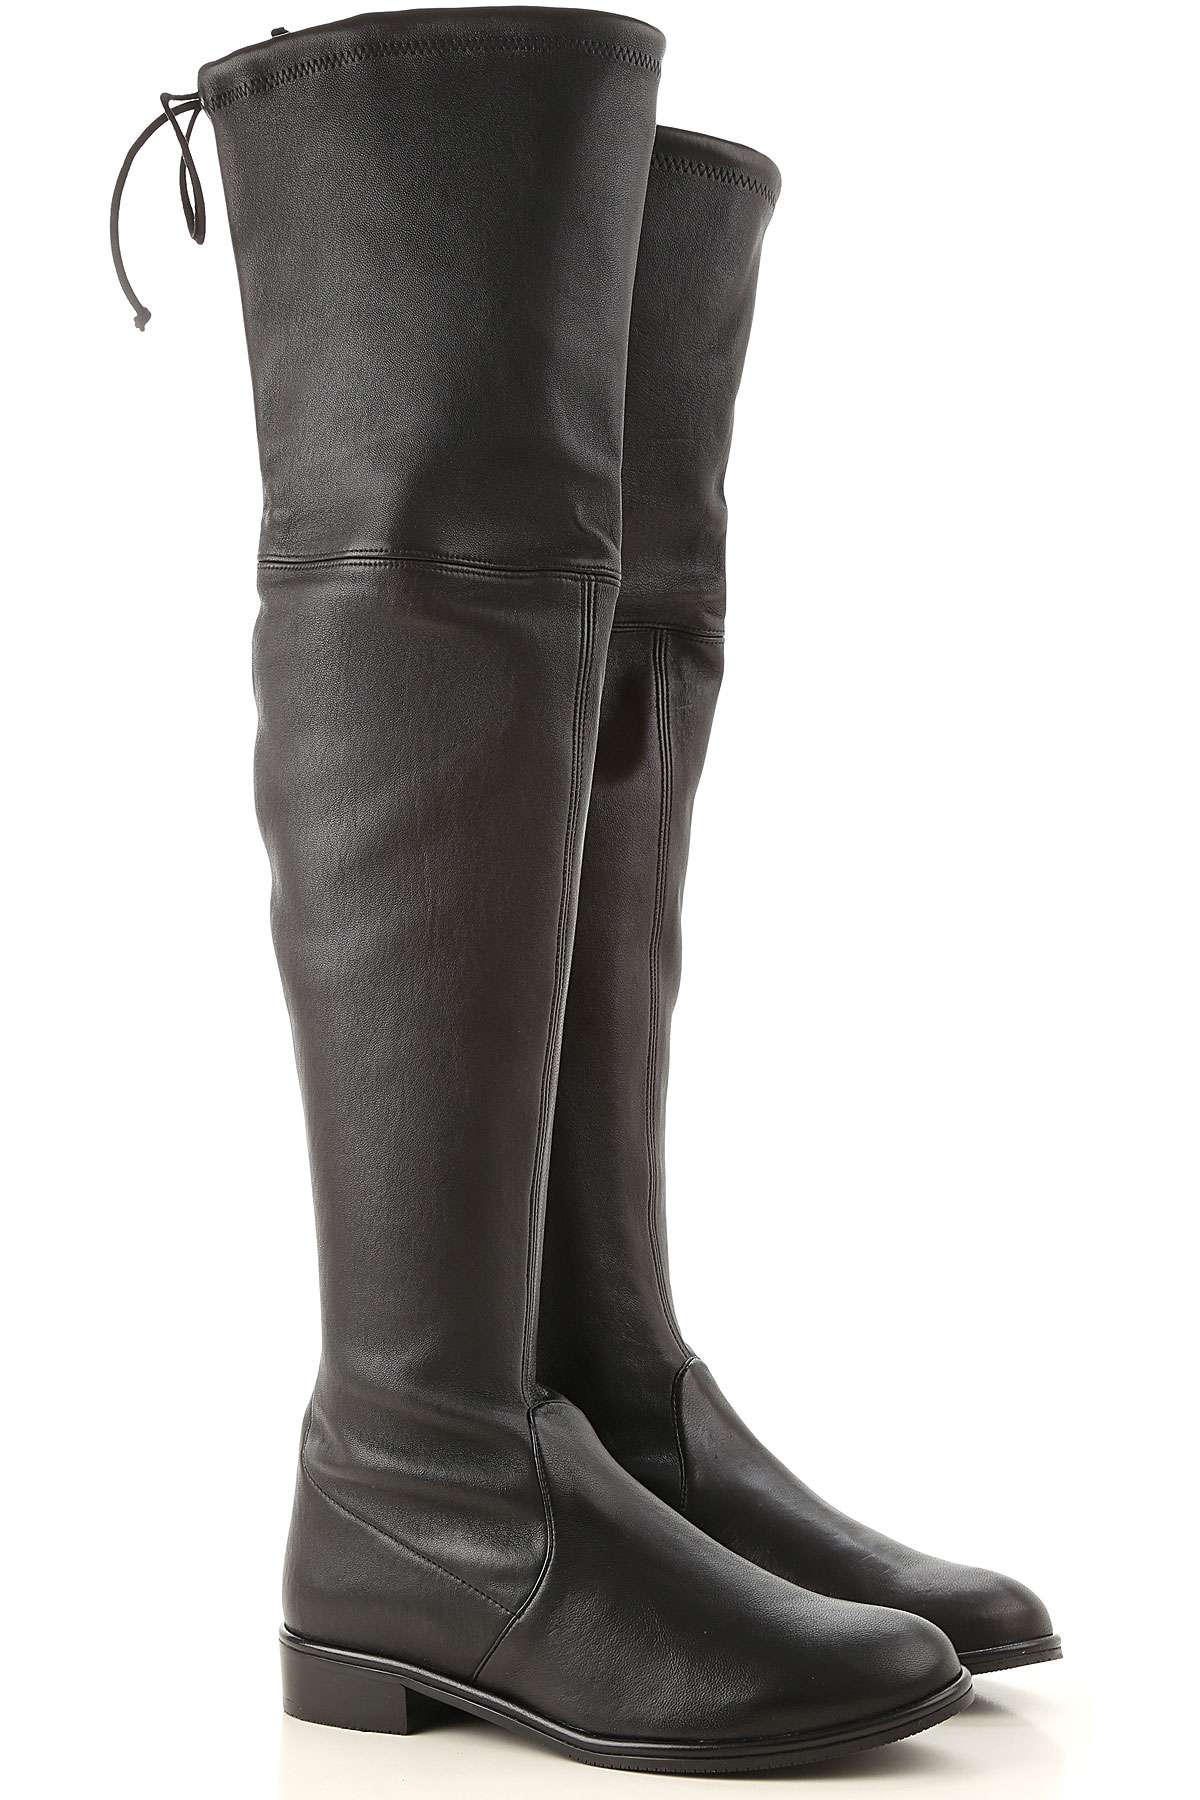 Stuart Weitzman Boots for Women, Booties On Sale, Black, Leather, 2019, US 5.5 (EU 36) US 6 (EU 36.5) US 7 (EU 37.5) US 6.5 (EU 37)